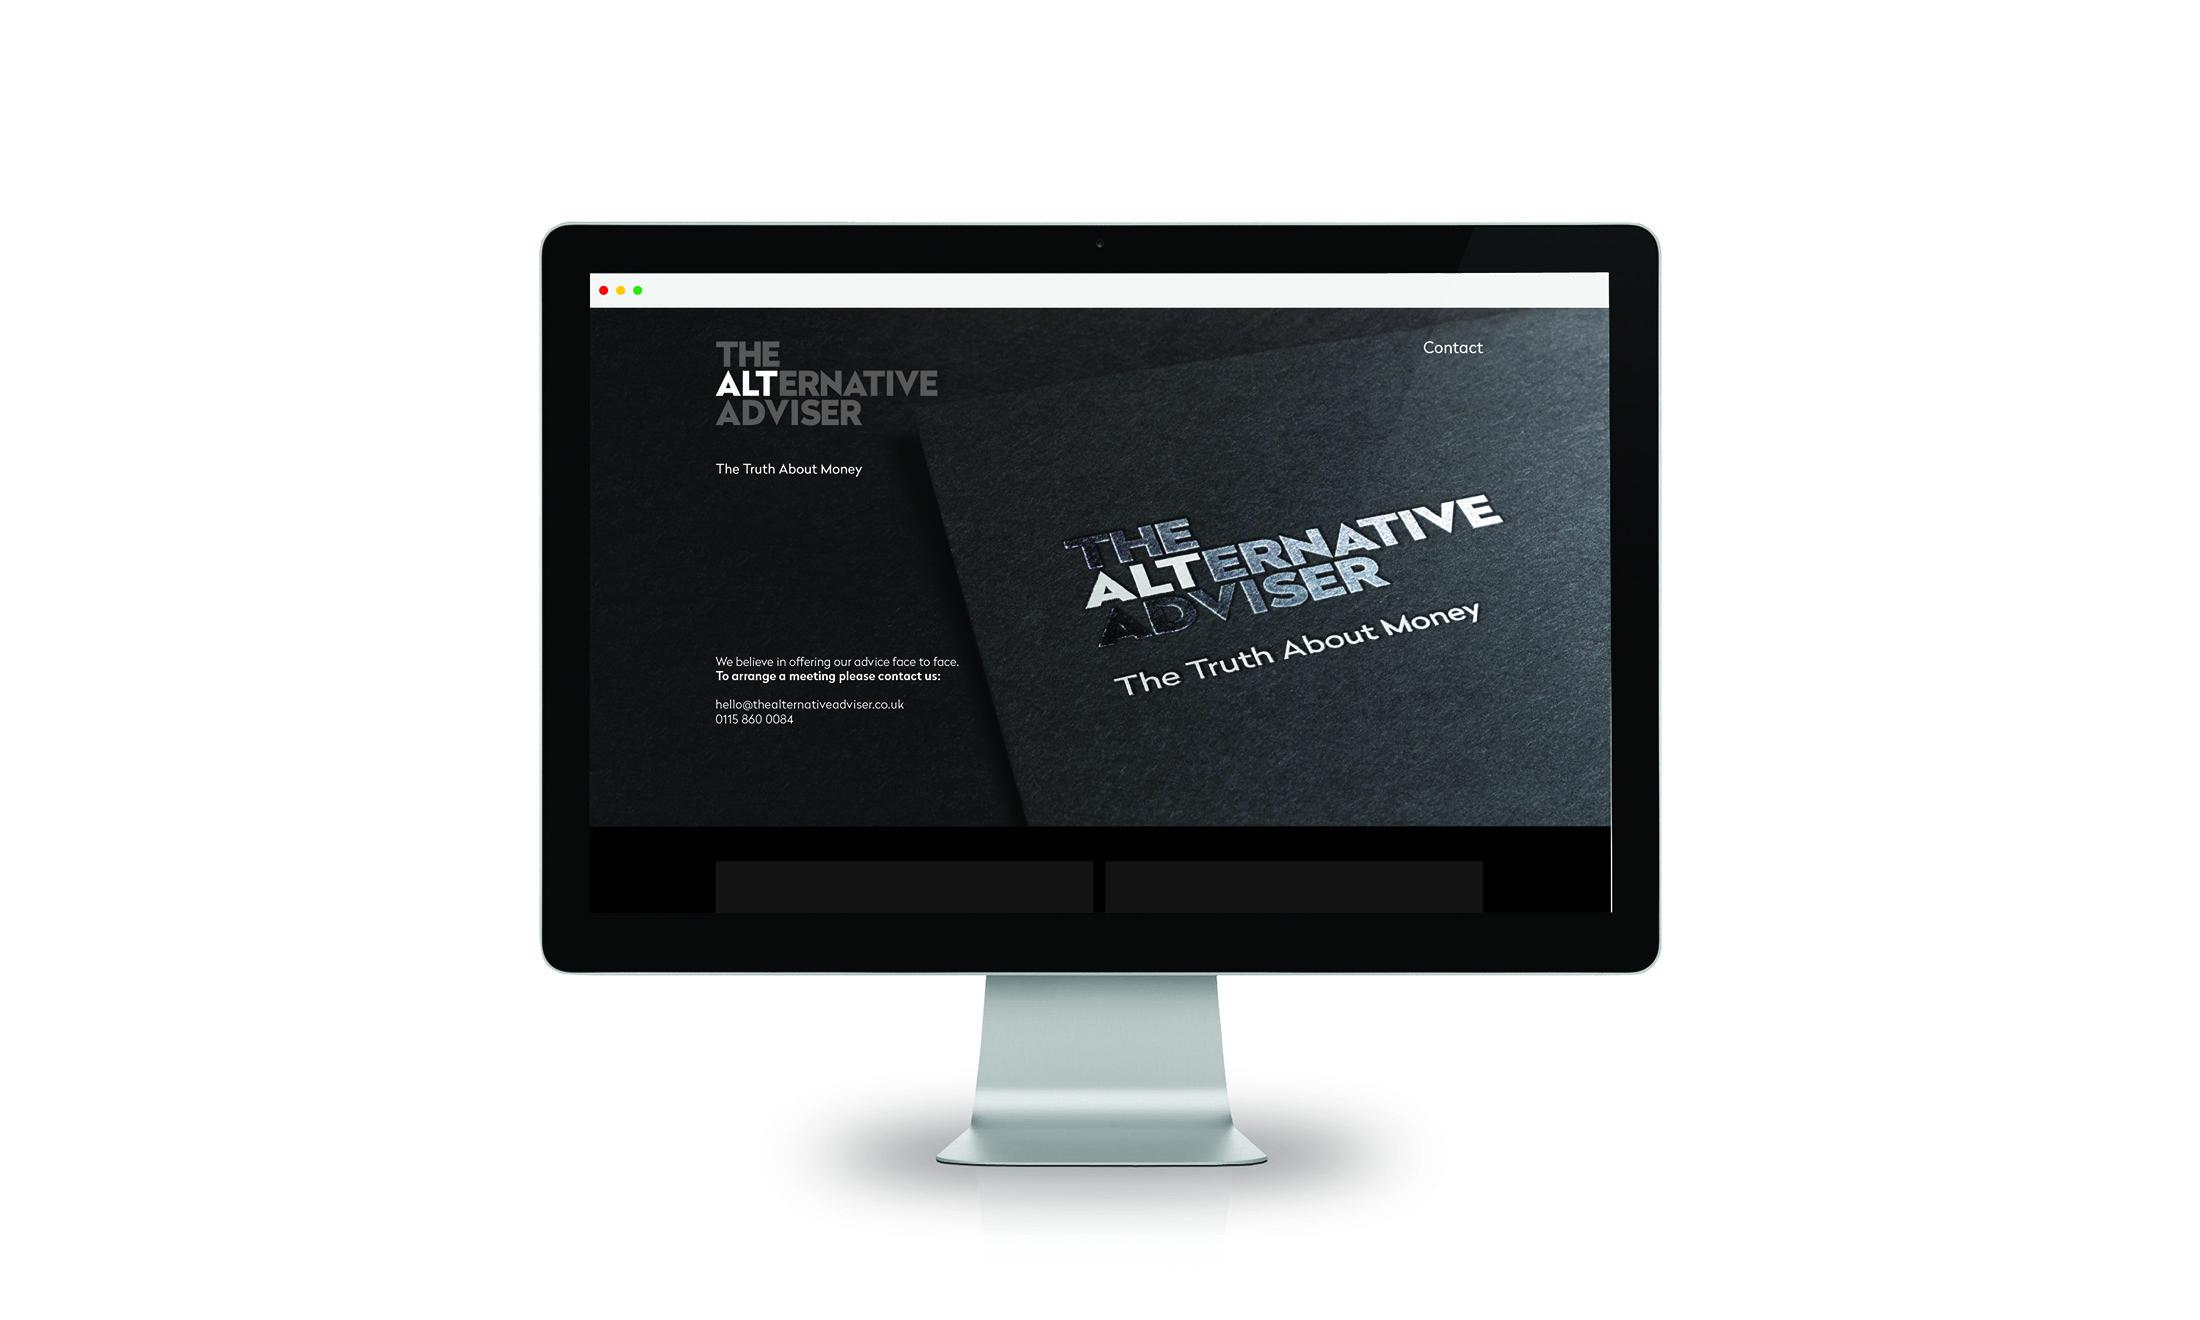 Alternative Adviser financial services brand website design